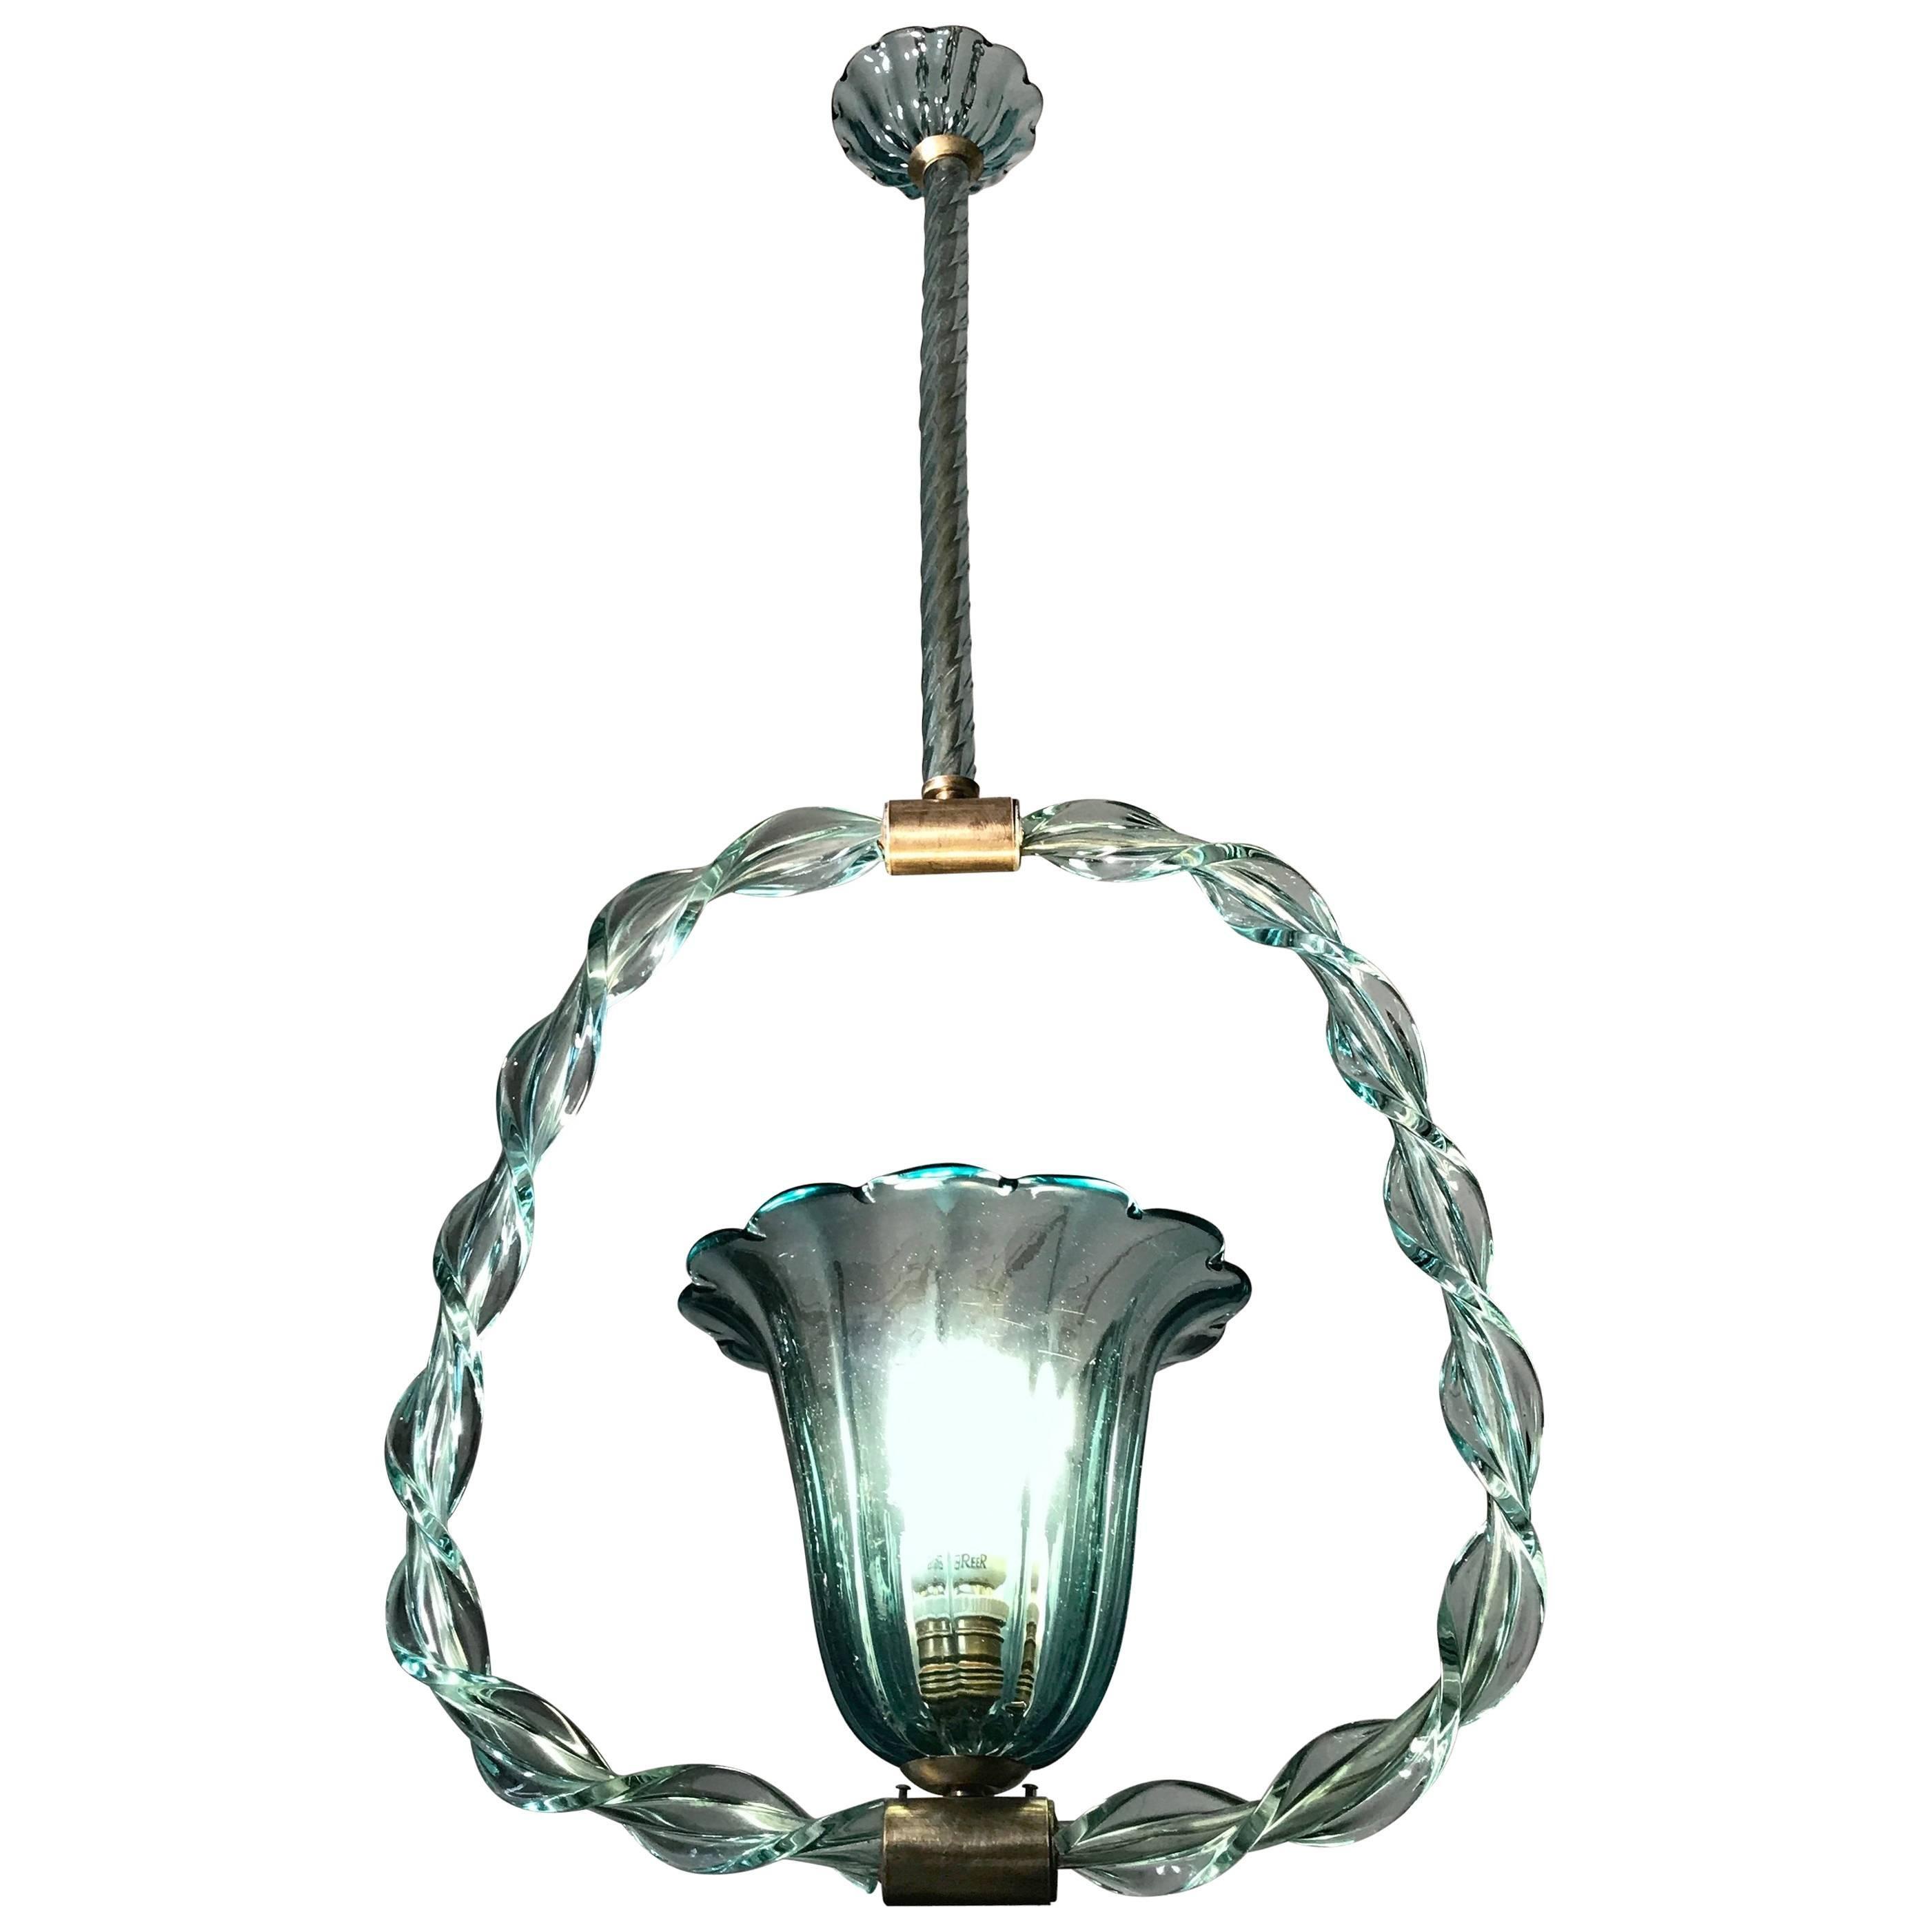 Charming 'Aquamarine' Murano Glass Chandelier by Ercole Barovier, 1940s